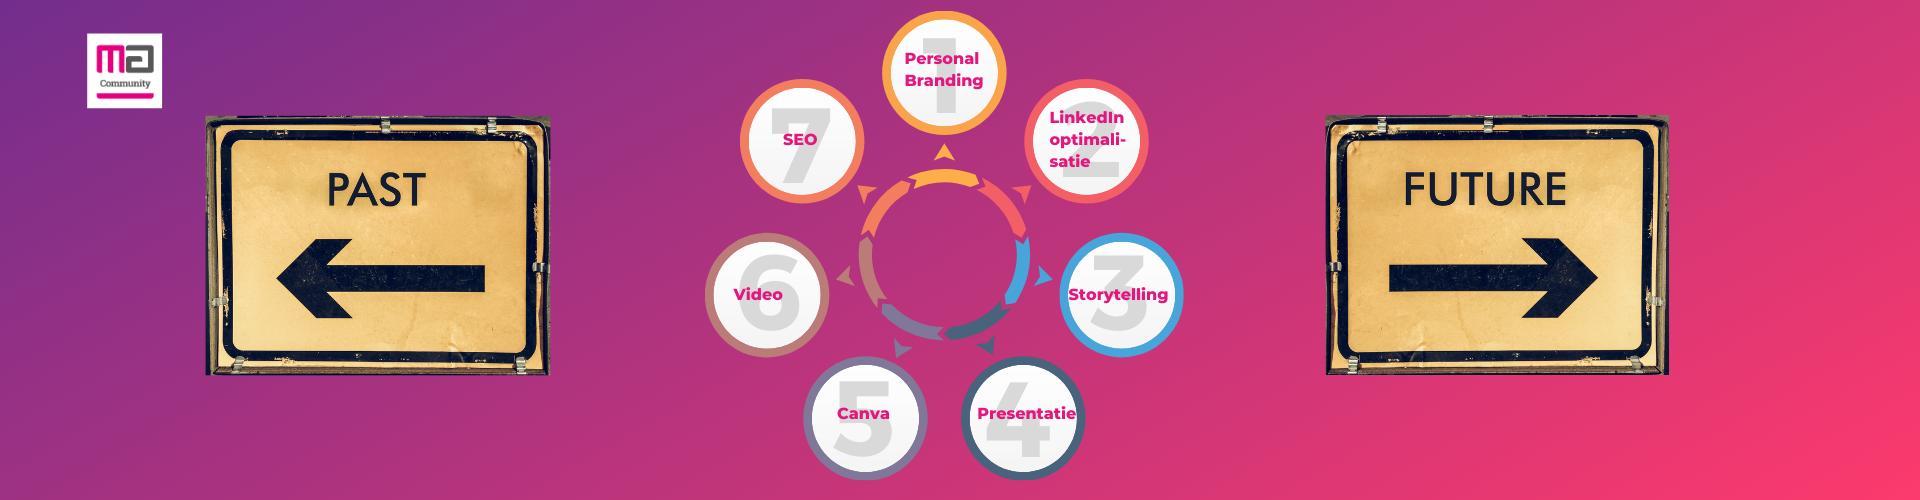 Personal Branding LinkedIn Storytelling